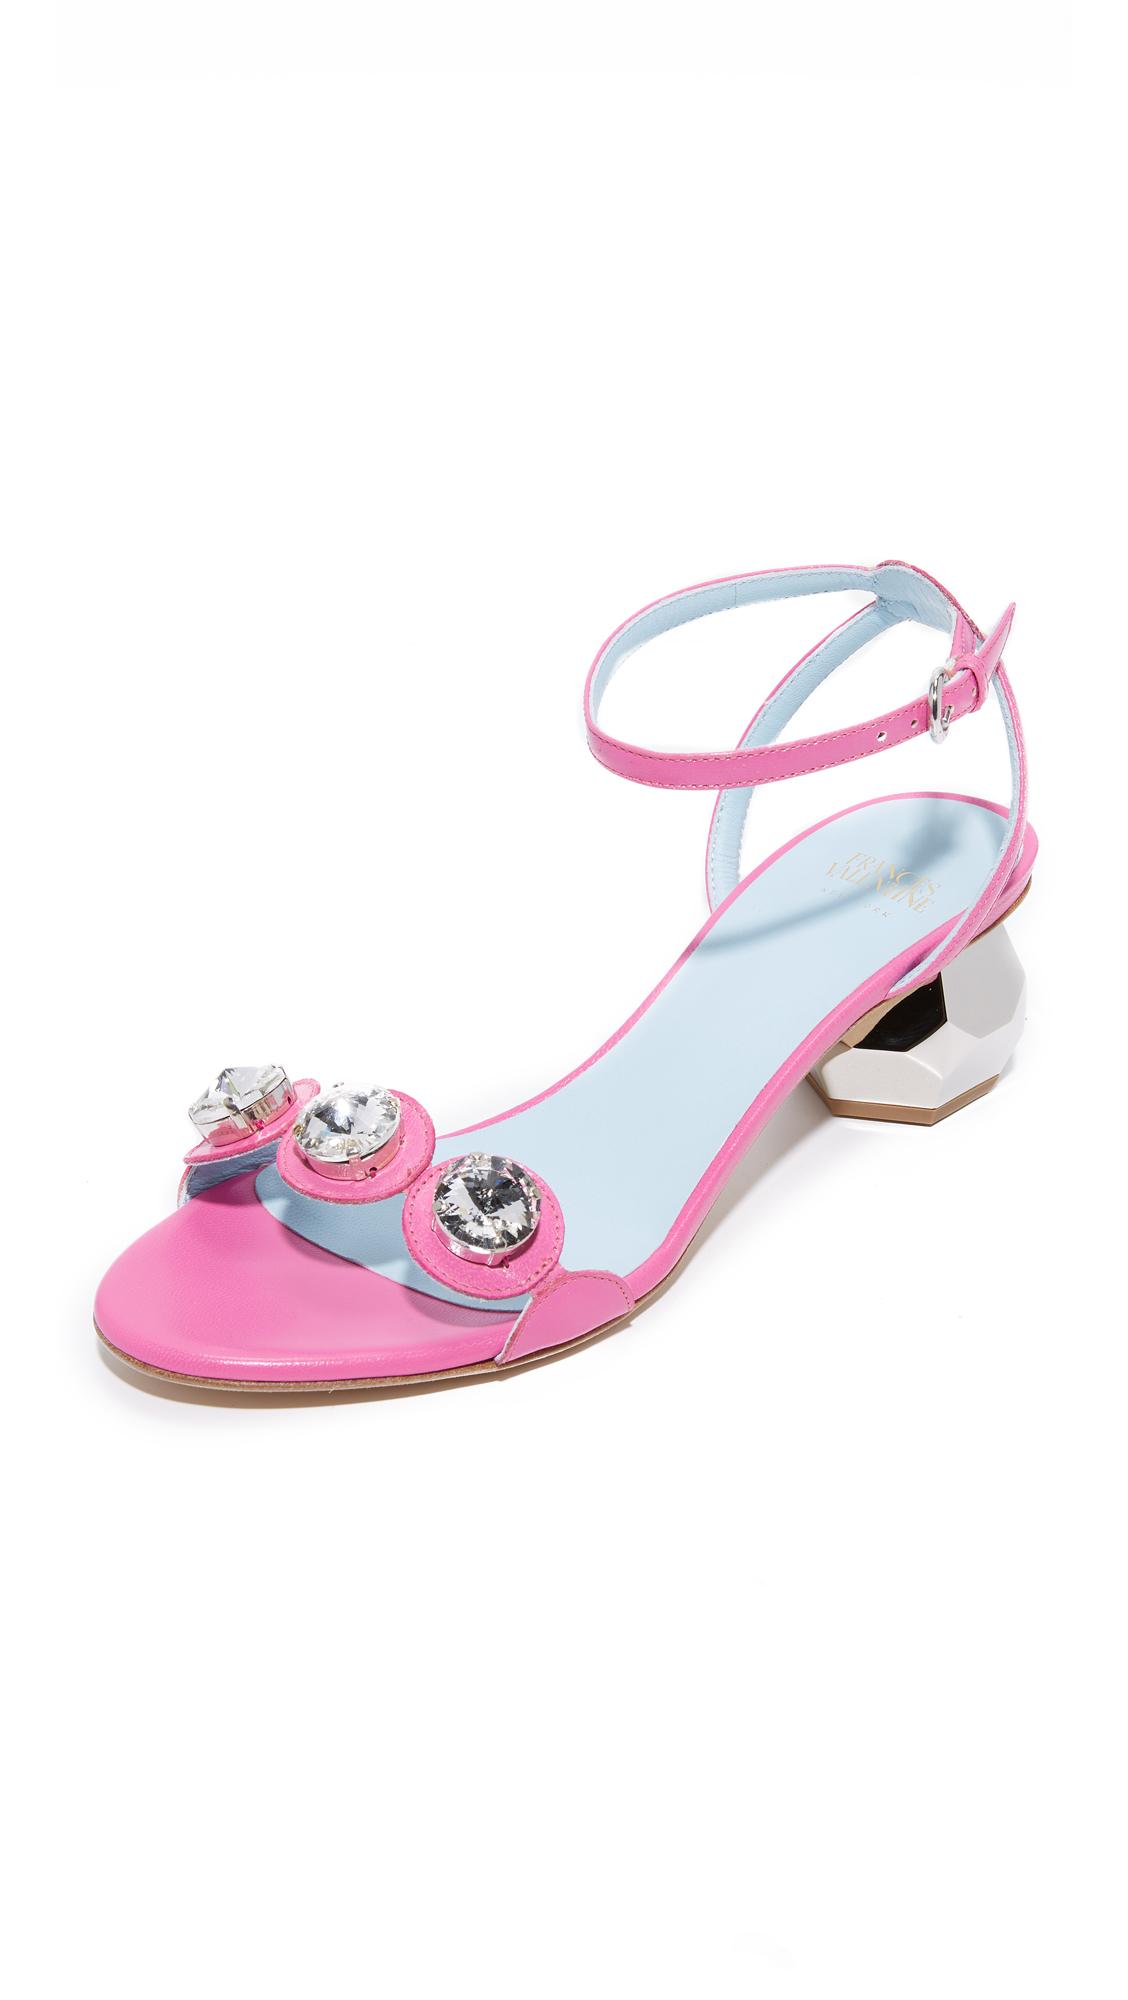 Frances Valentine Beatrix Jeweled City Sandals - Pink